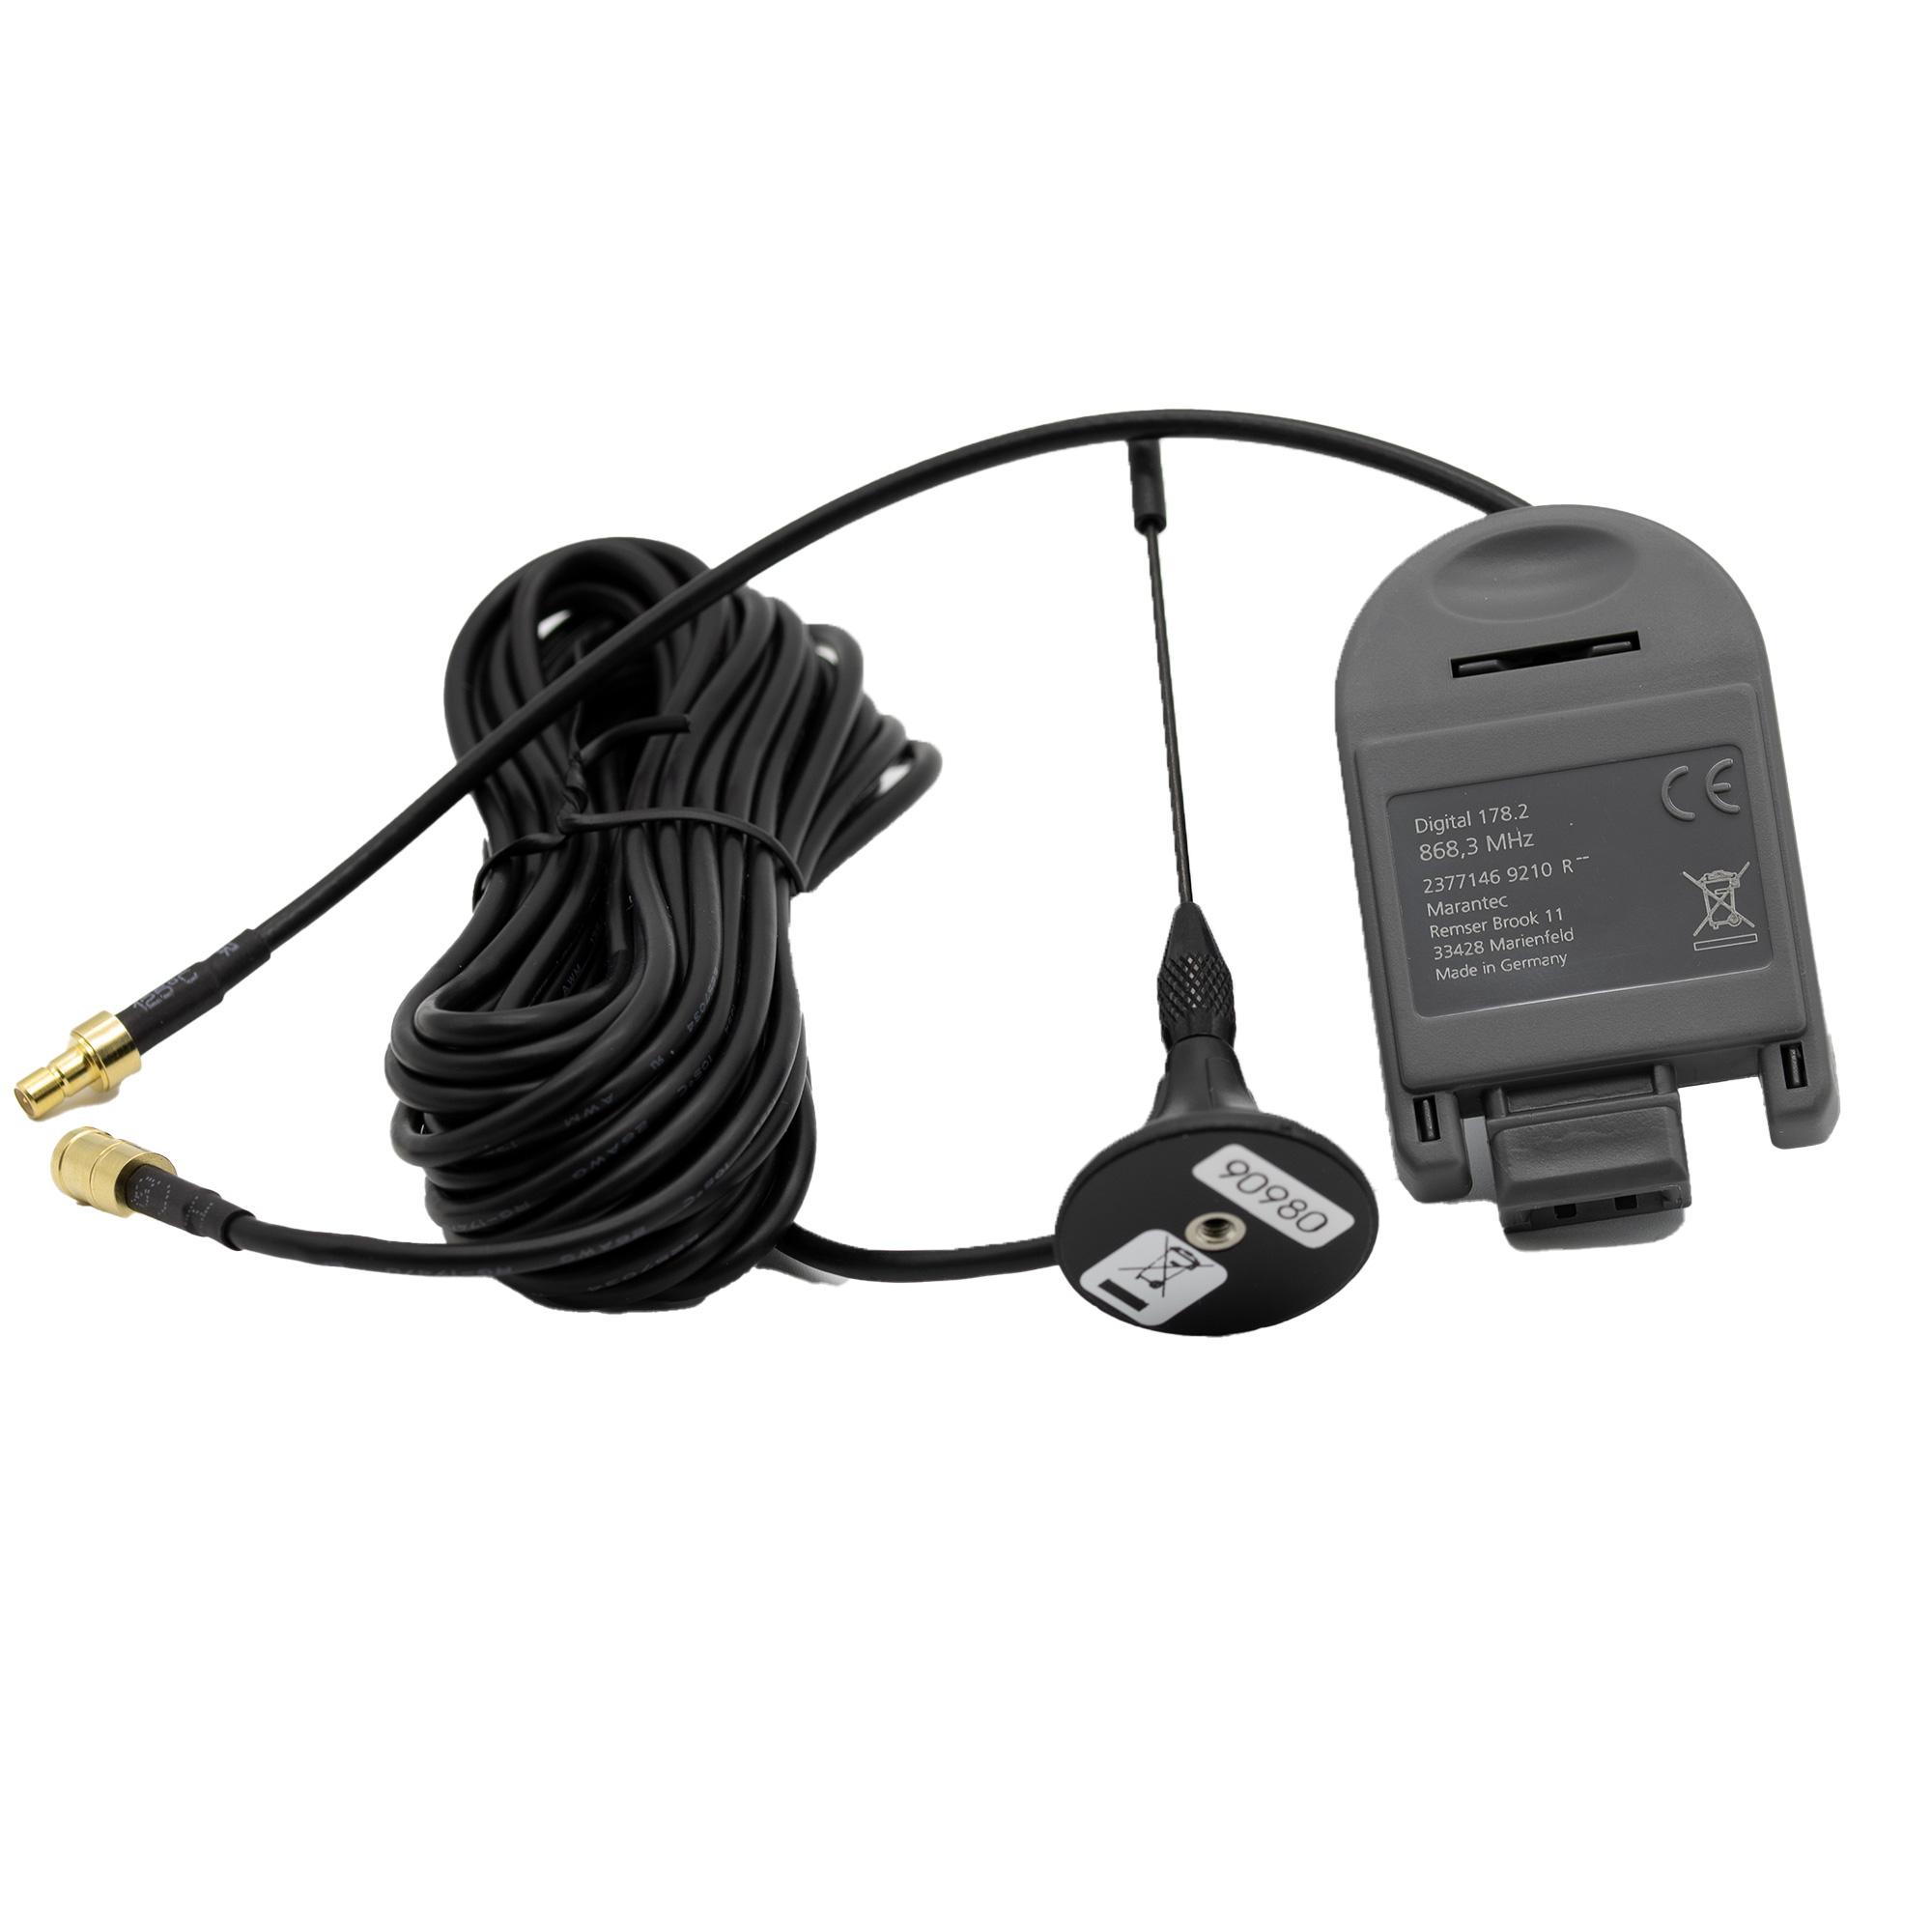 Marantec Digital 178.2 inkl. Koax-Antenne